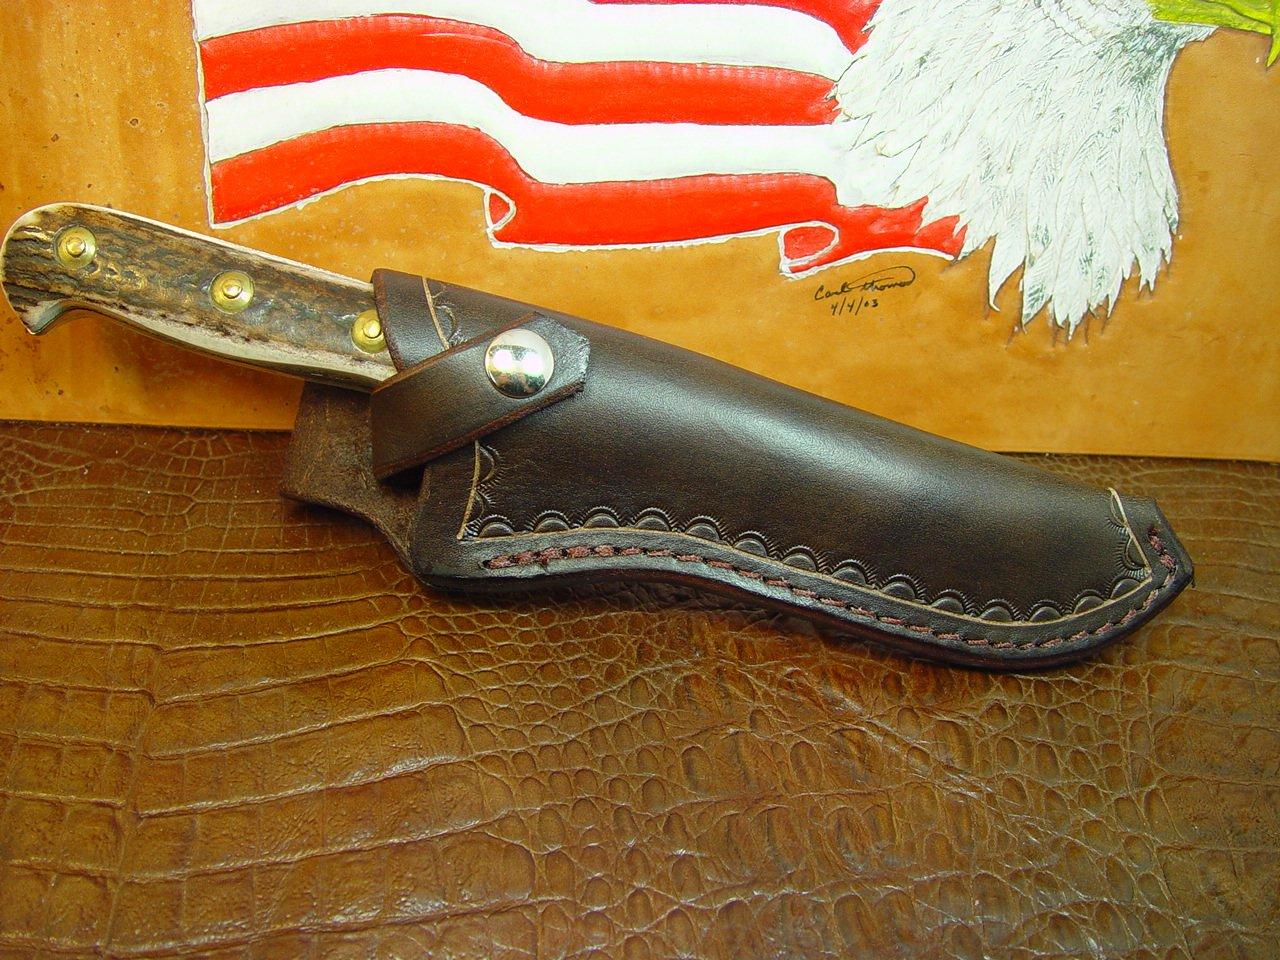 Custom Leather Sheath for Puma White Hunter Knife. Knife Not Included